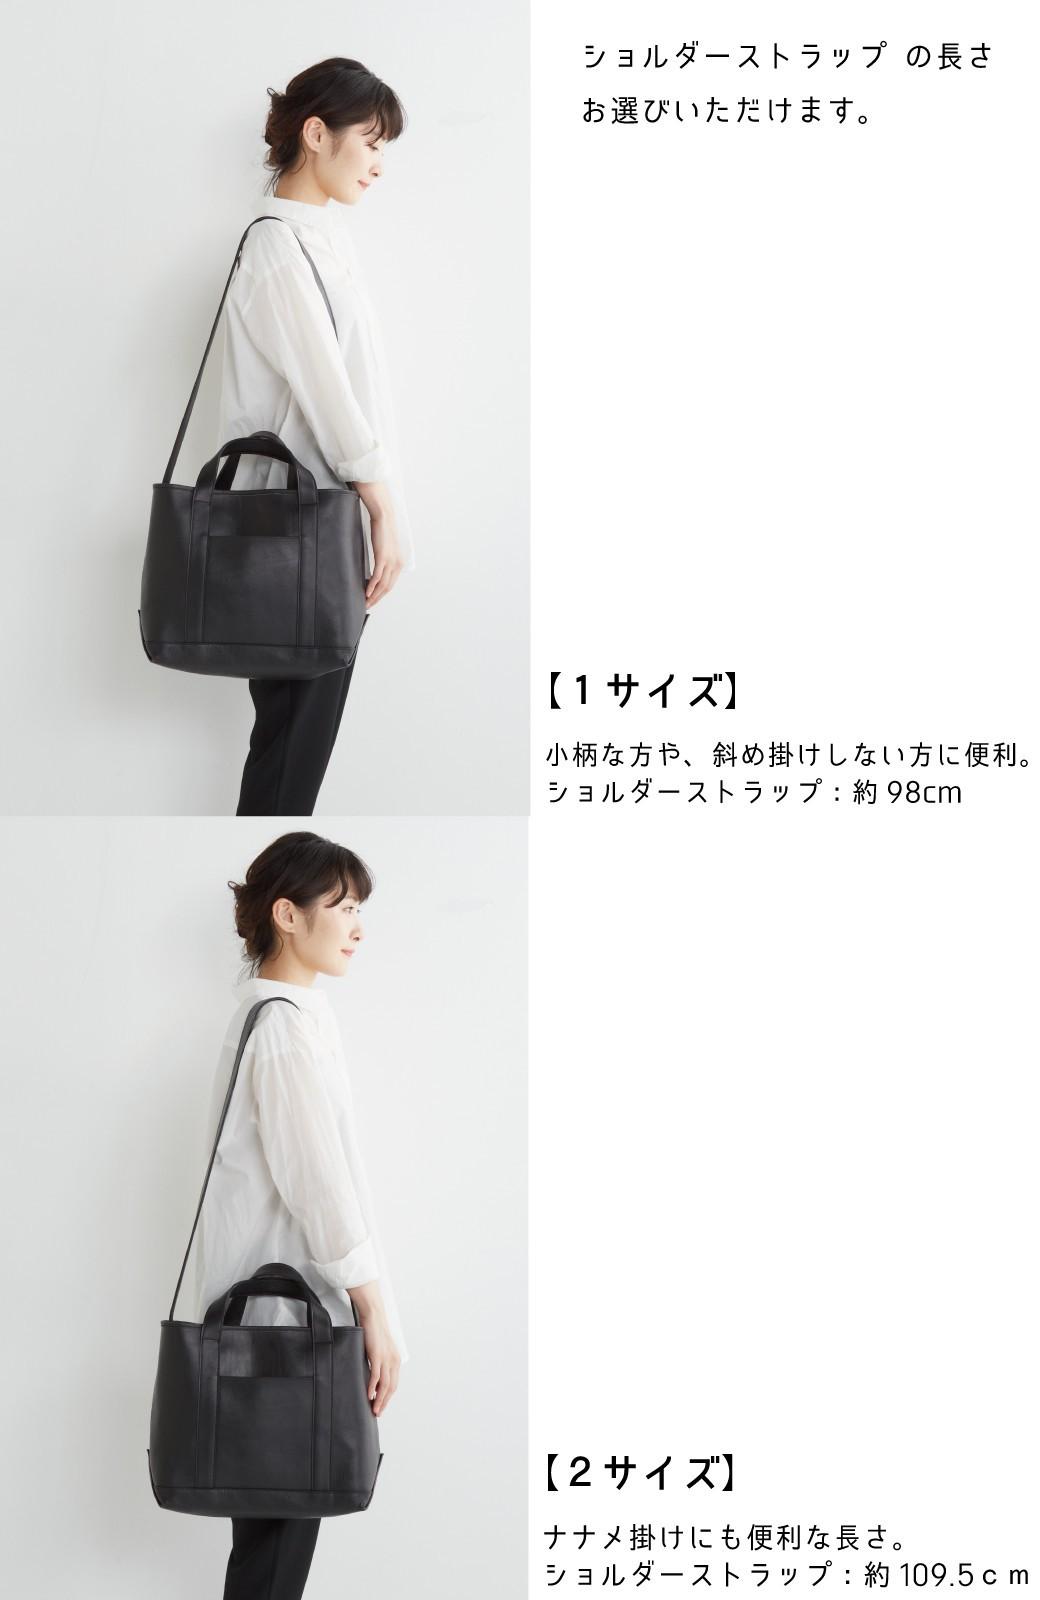 haco! made in JAPAN の本革トートバッグ(ショルダー付き) by que made me <ブラック>の商品写真7